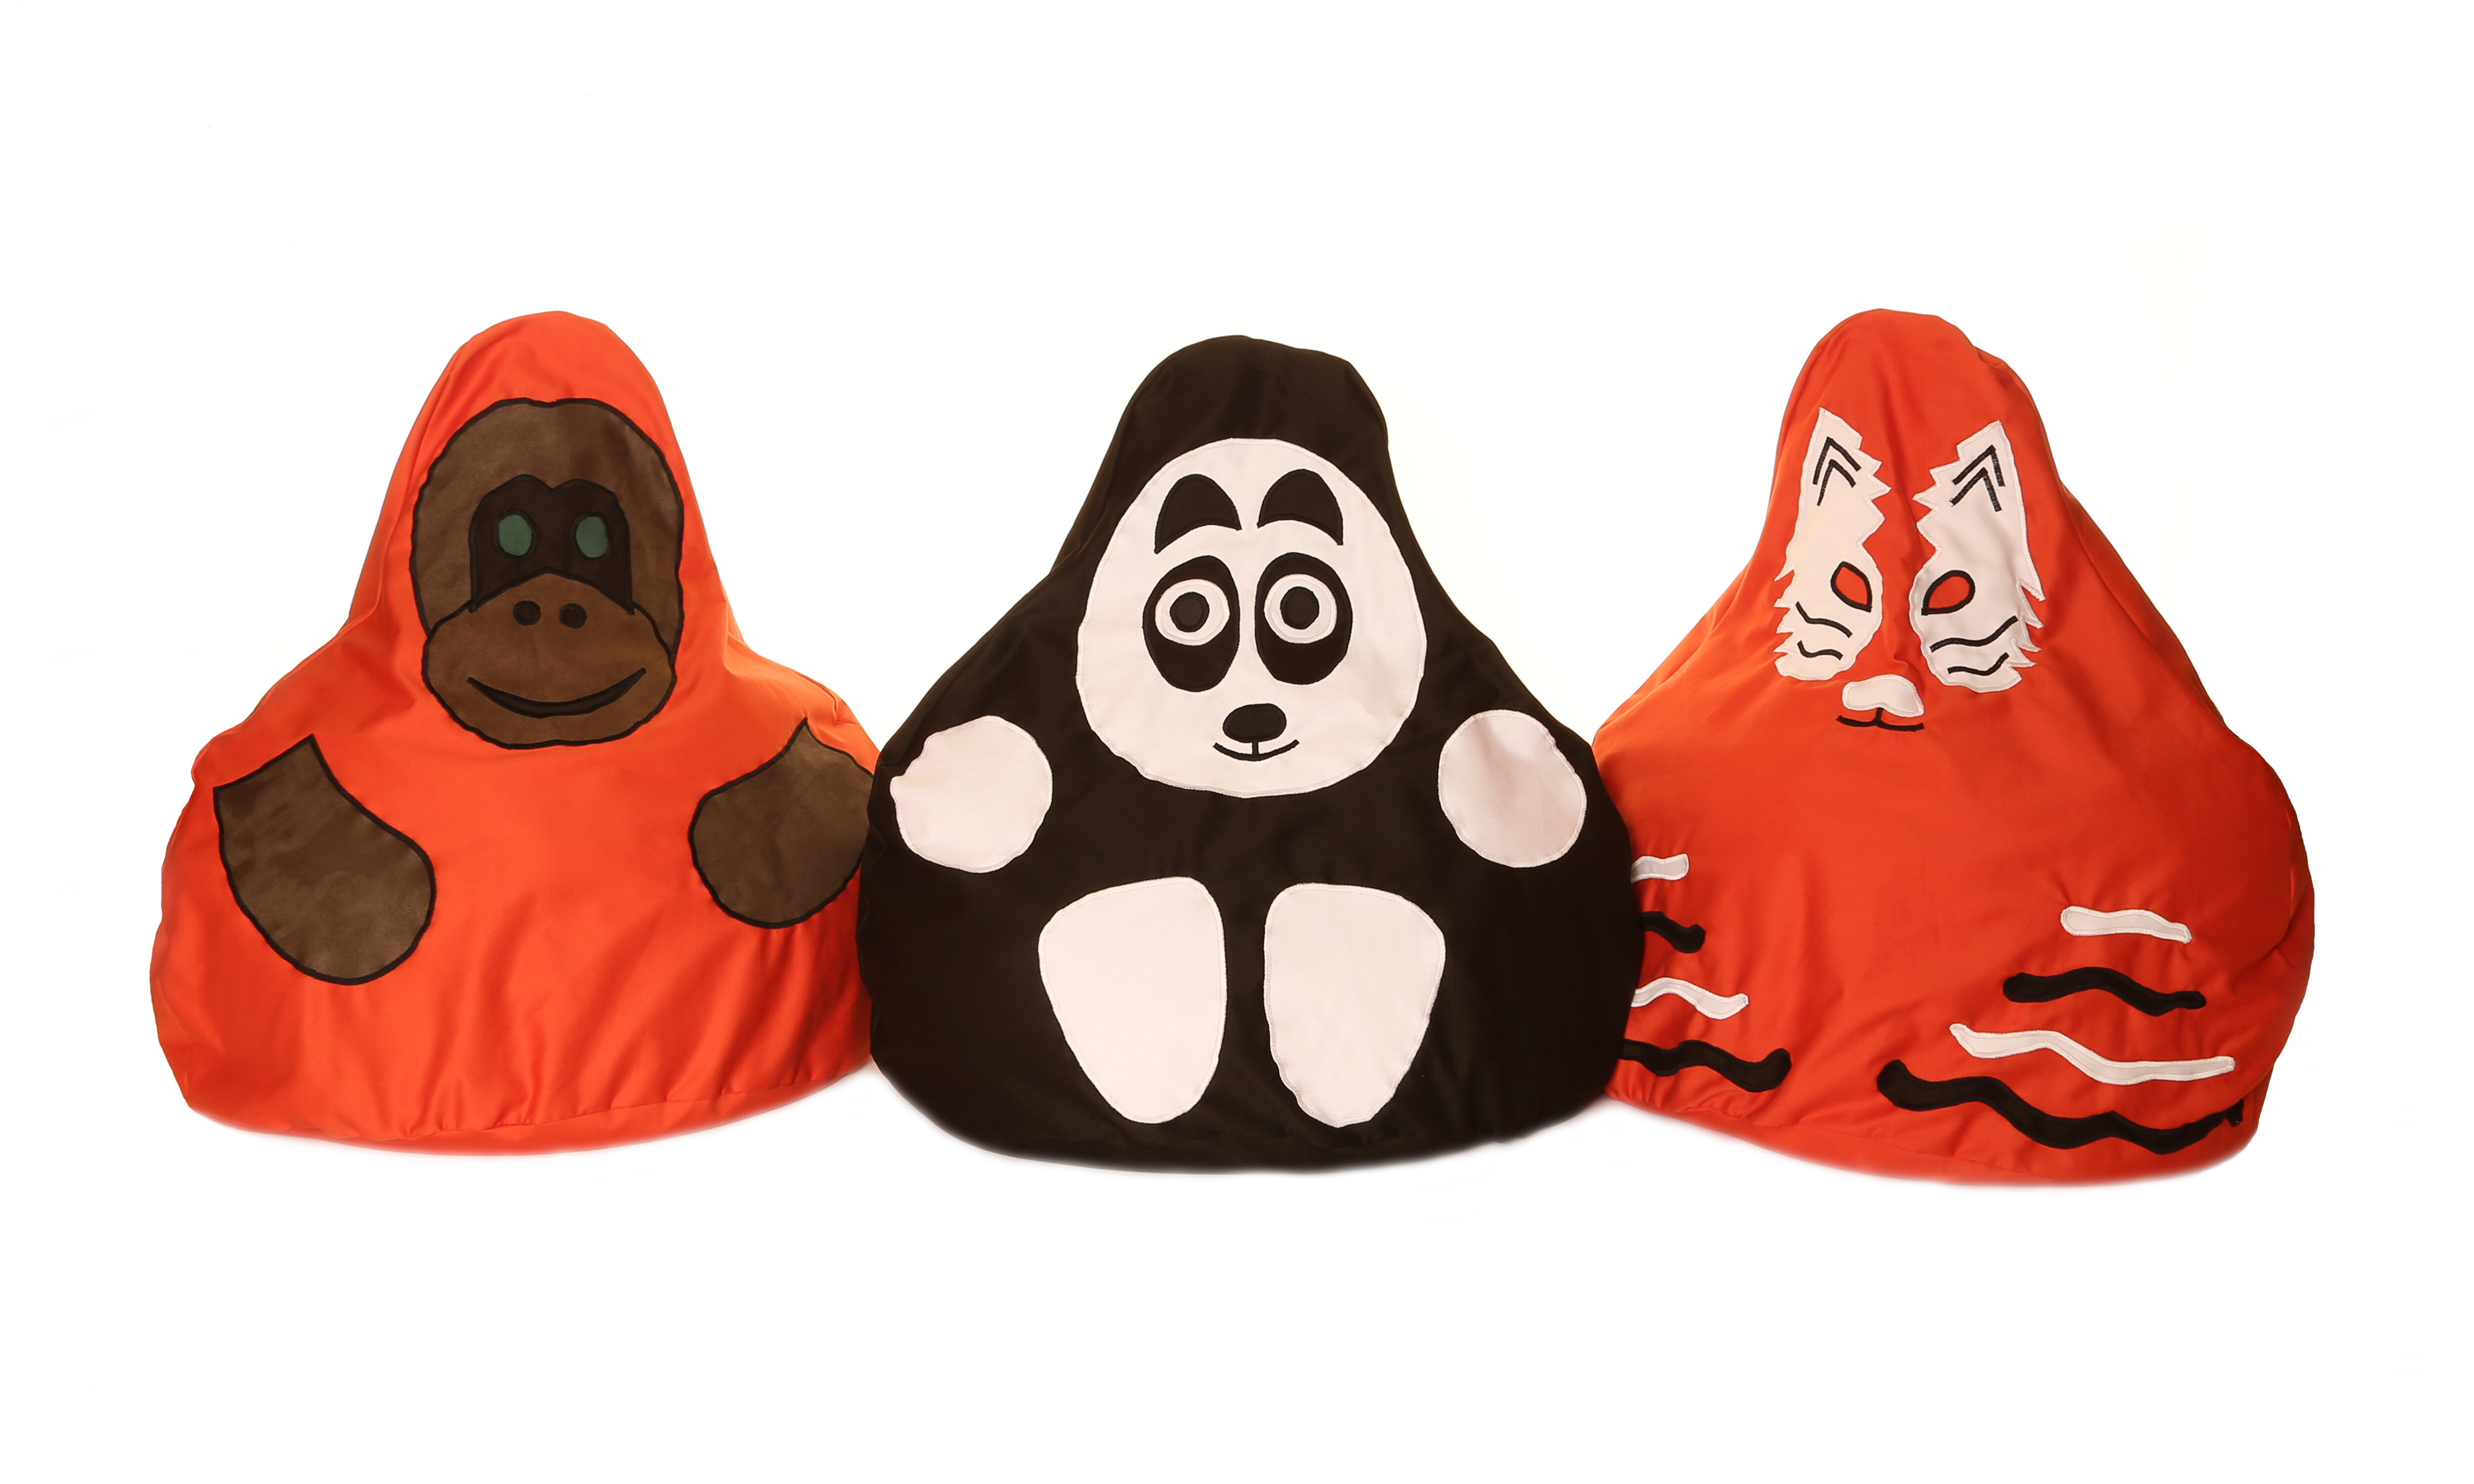 Full Of Beans 3 Piece Endangered Species Character Bean Bag Chair